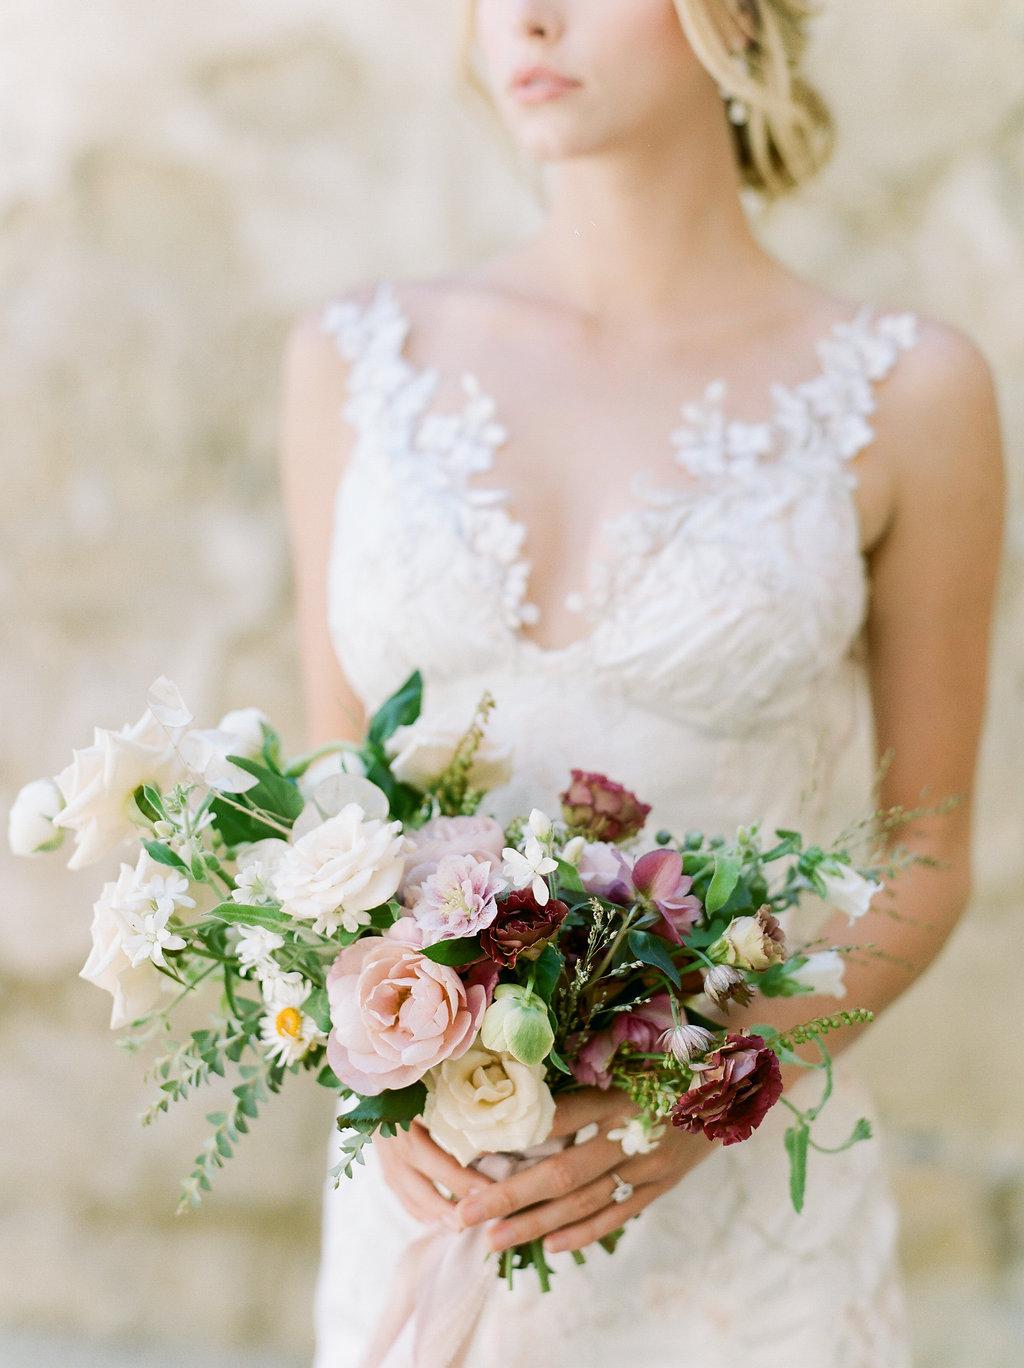 Spanish Mission Style Wedding Ideas Bridal Bouquet Summer Flowers Finding Flora Wedding Sparrow Fine Art